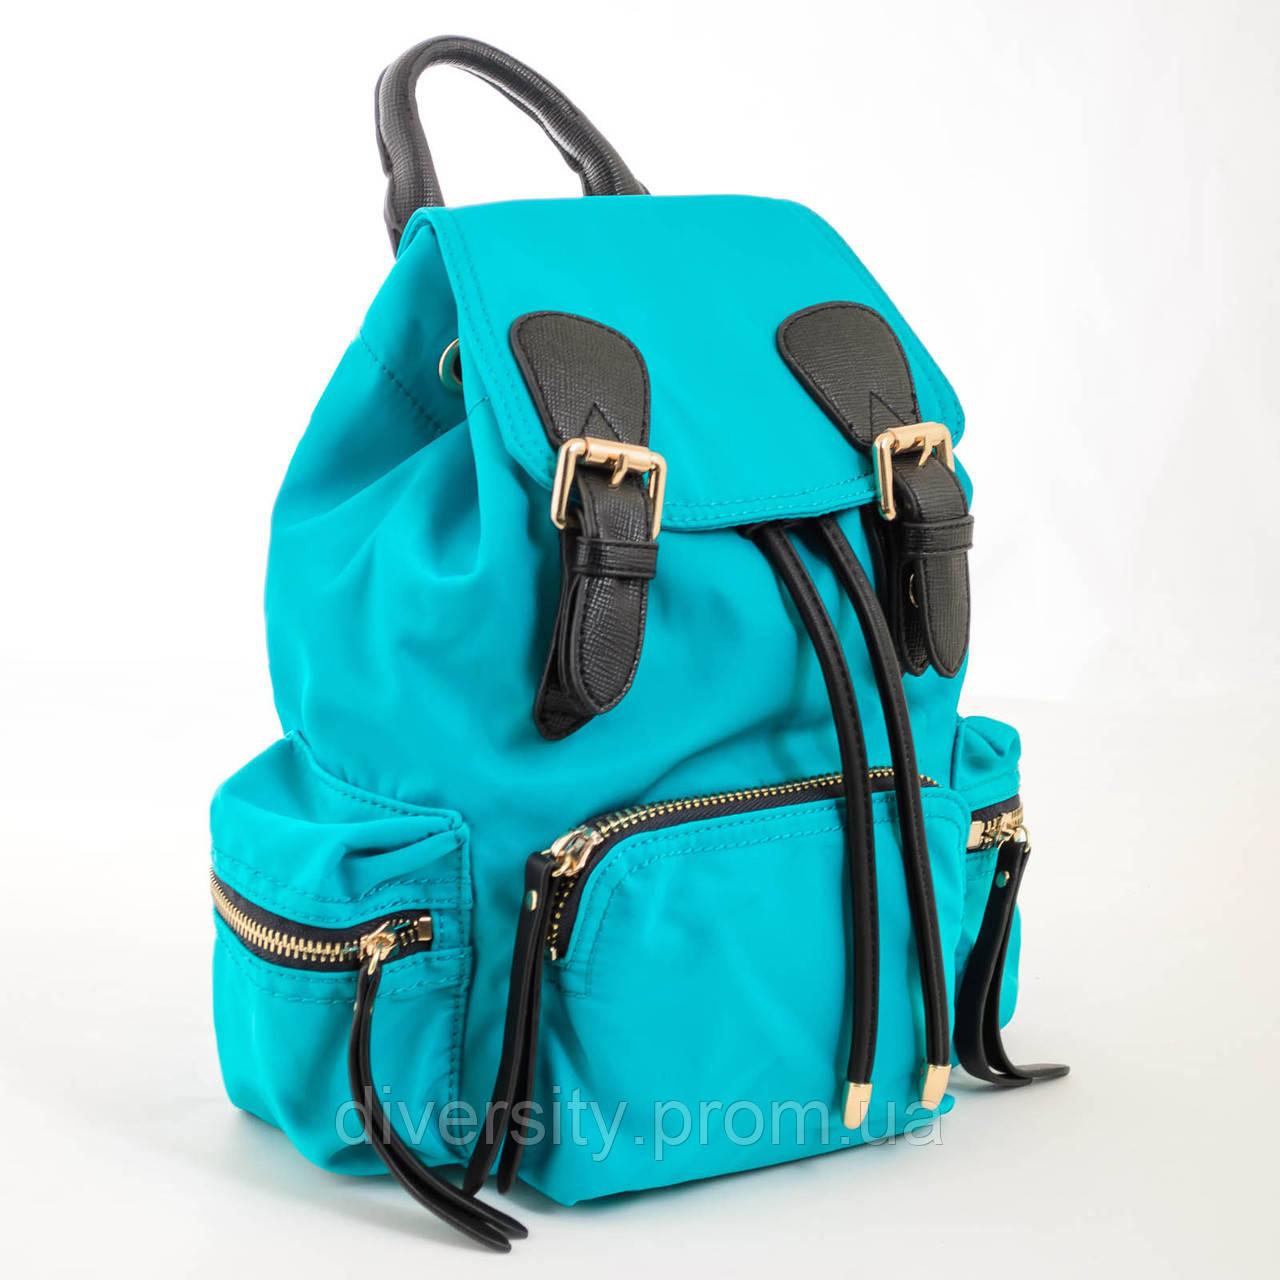 Сумка-рюкзак YES, светло-синий